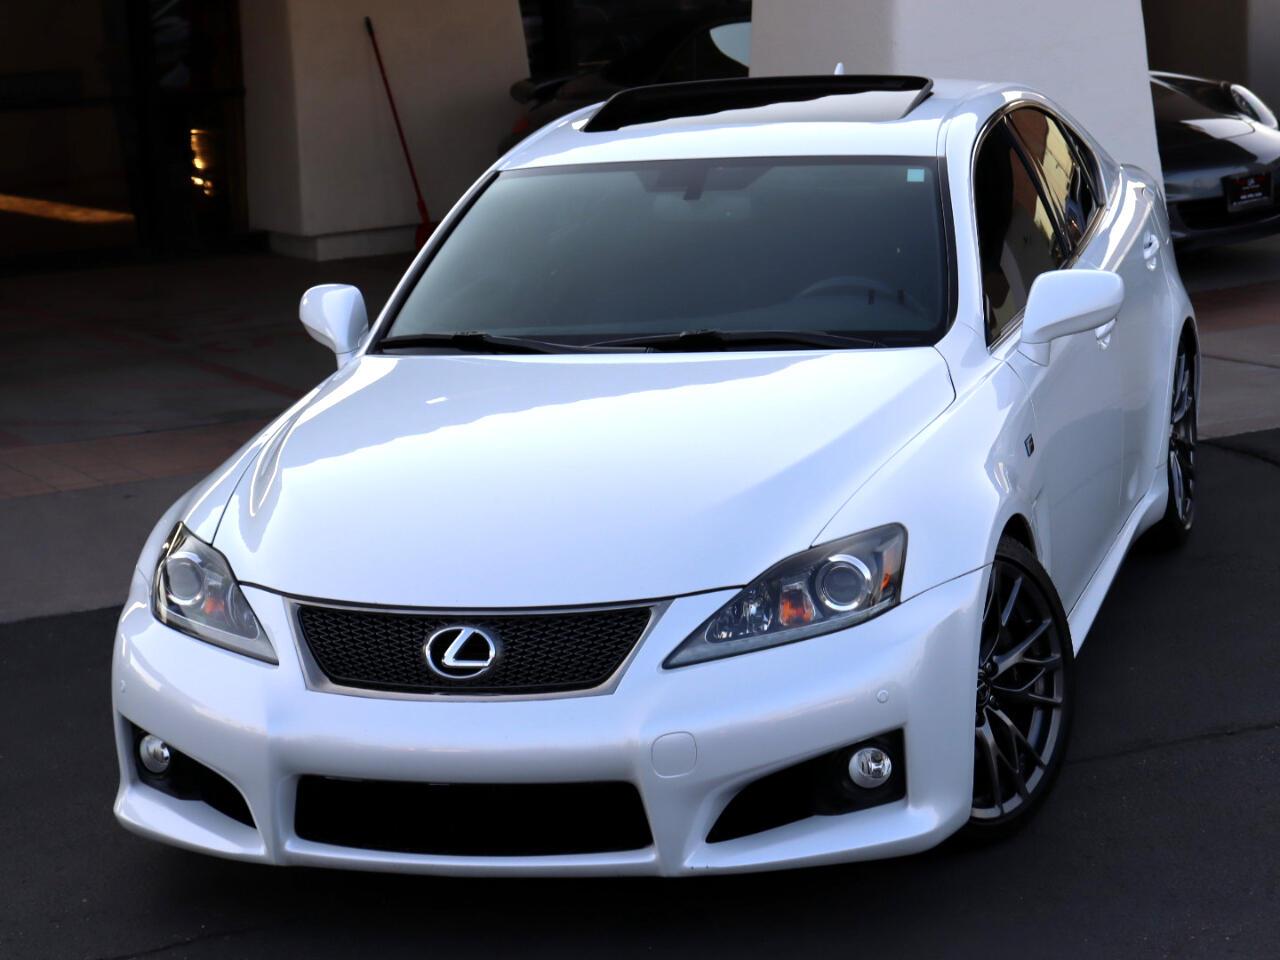 Lexus IS F 4D Sedan 2011